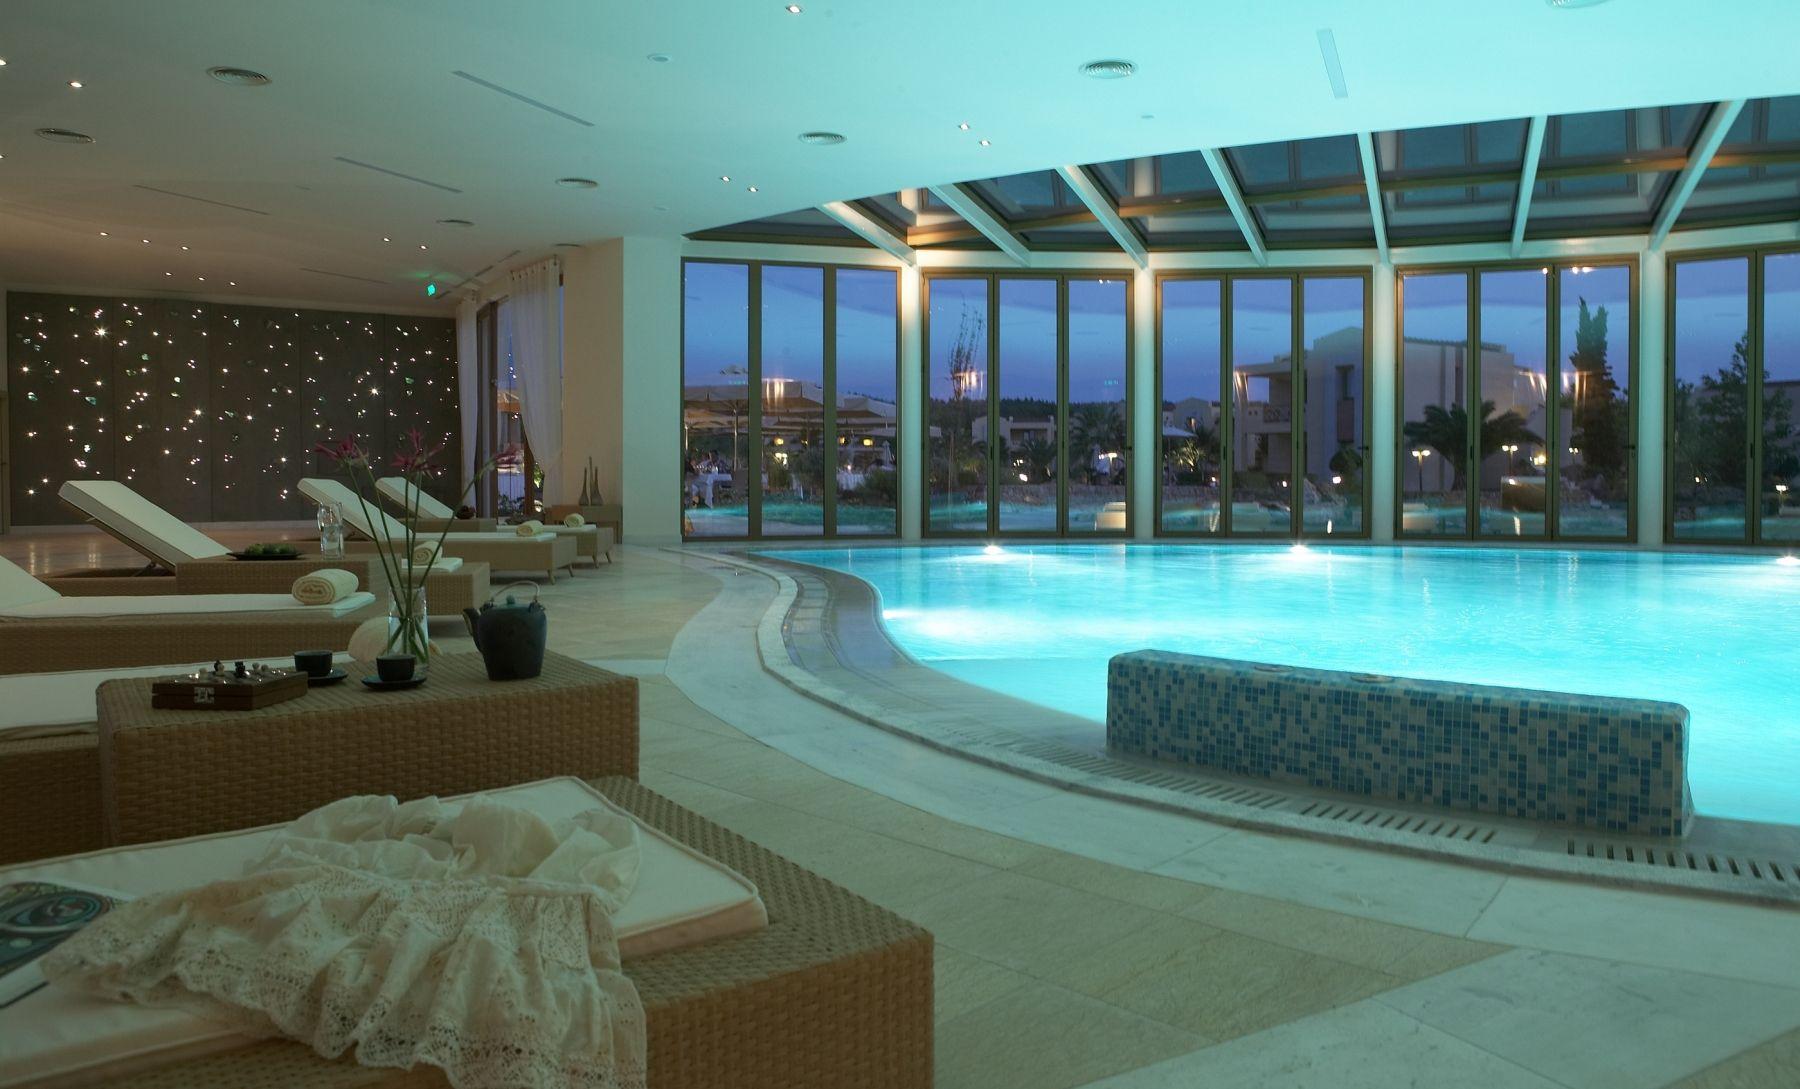 indoor luxury pools luxury homes with indoor pools luxury homes with indoor pools luxury house poolmost luxurious pools - Luxury Homes With Indoor Pools